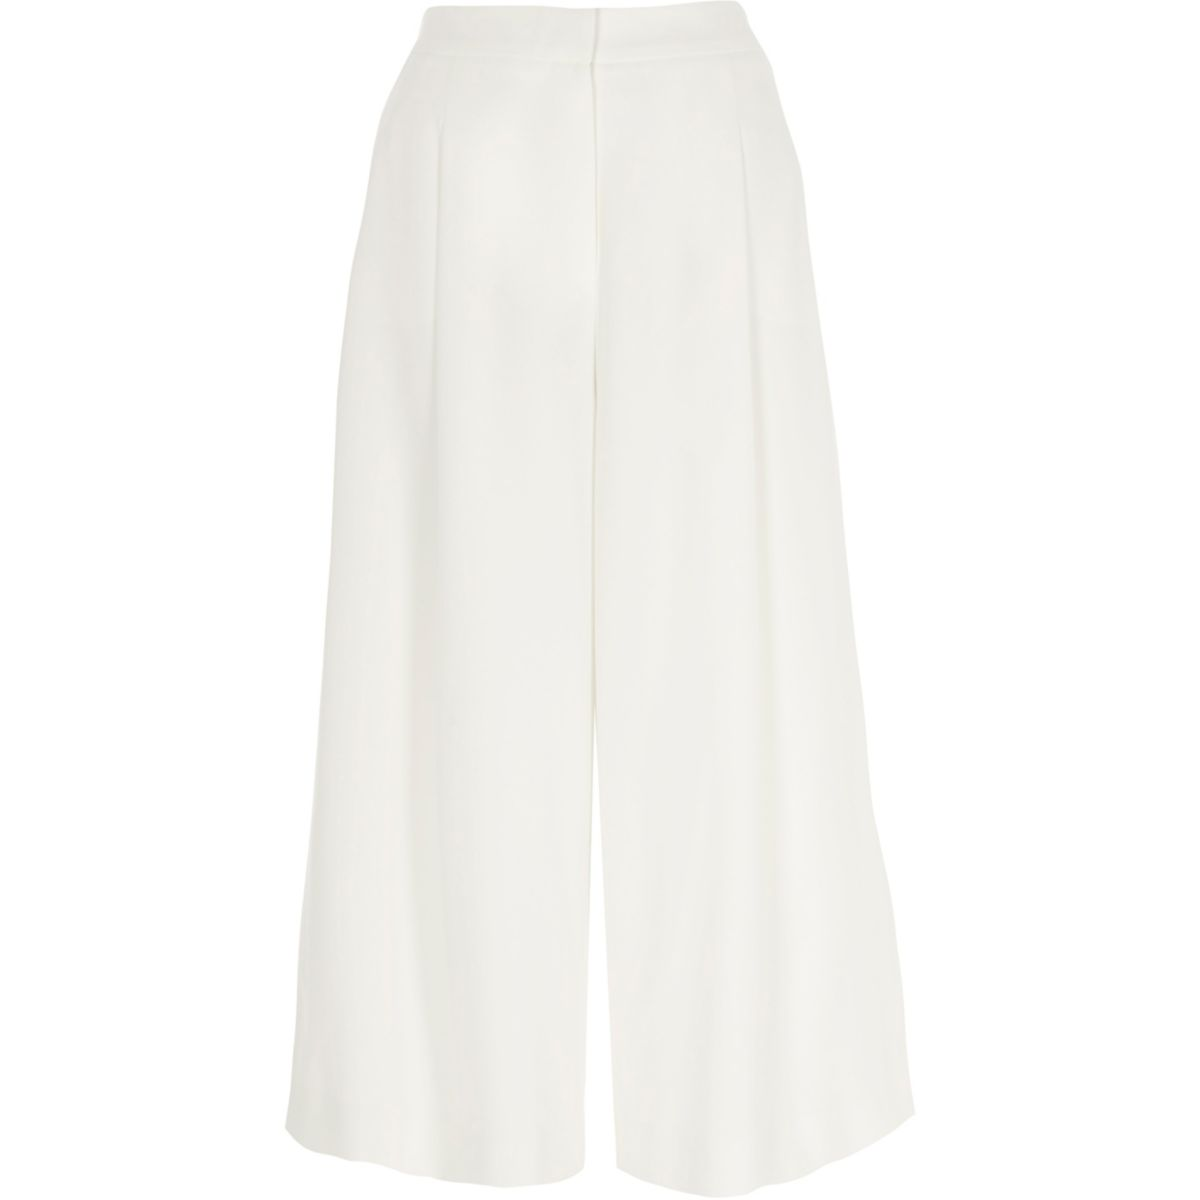 White soft woven culottes